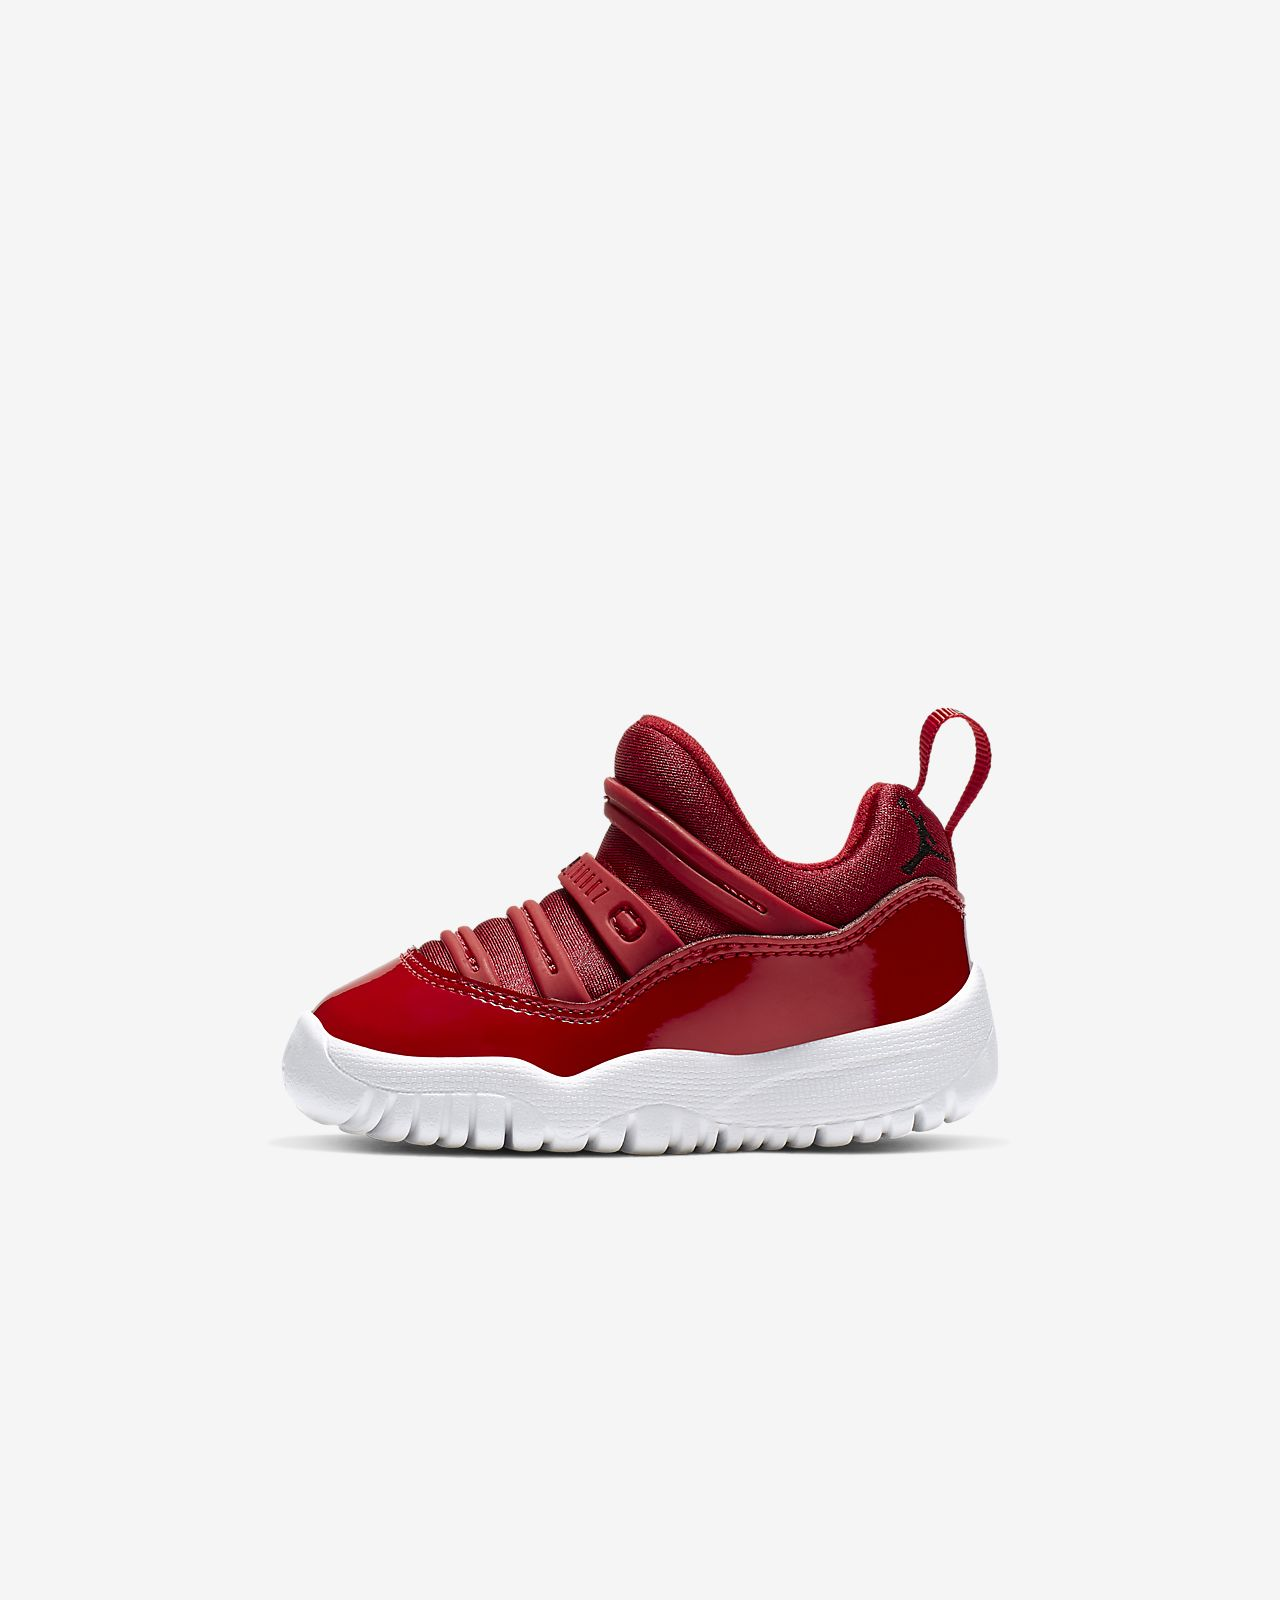 Air Jordan 11 Retro Little Flex Baby/Toddler Shoe